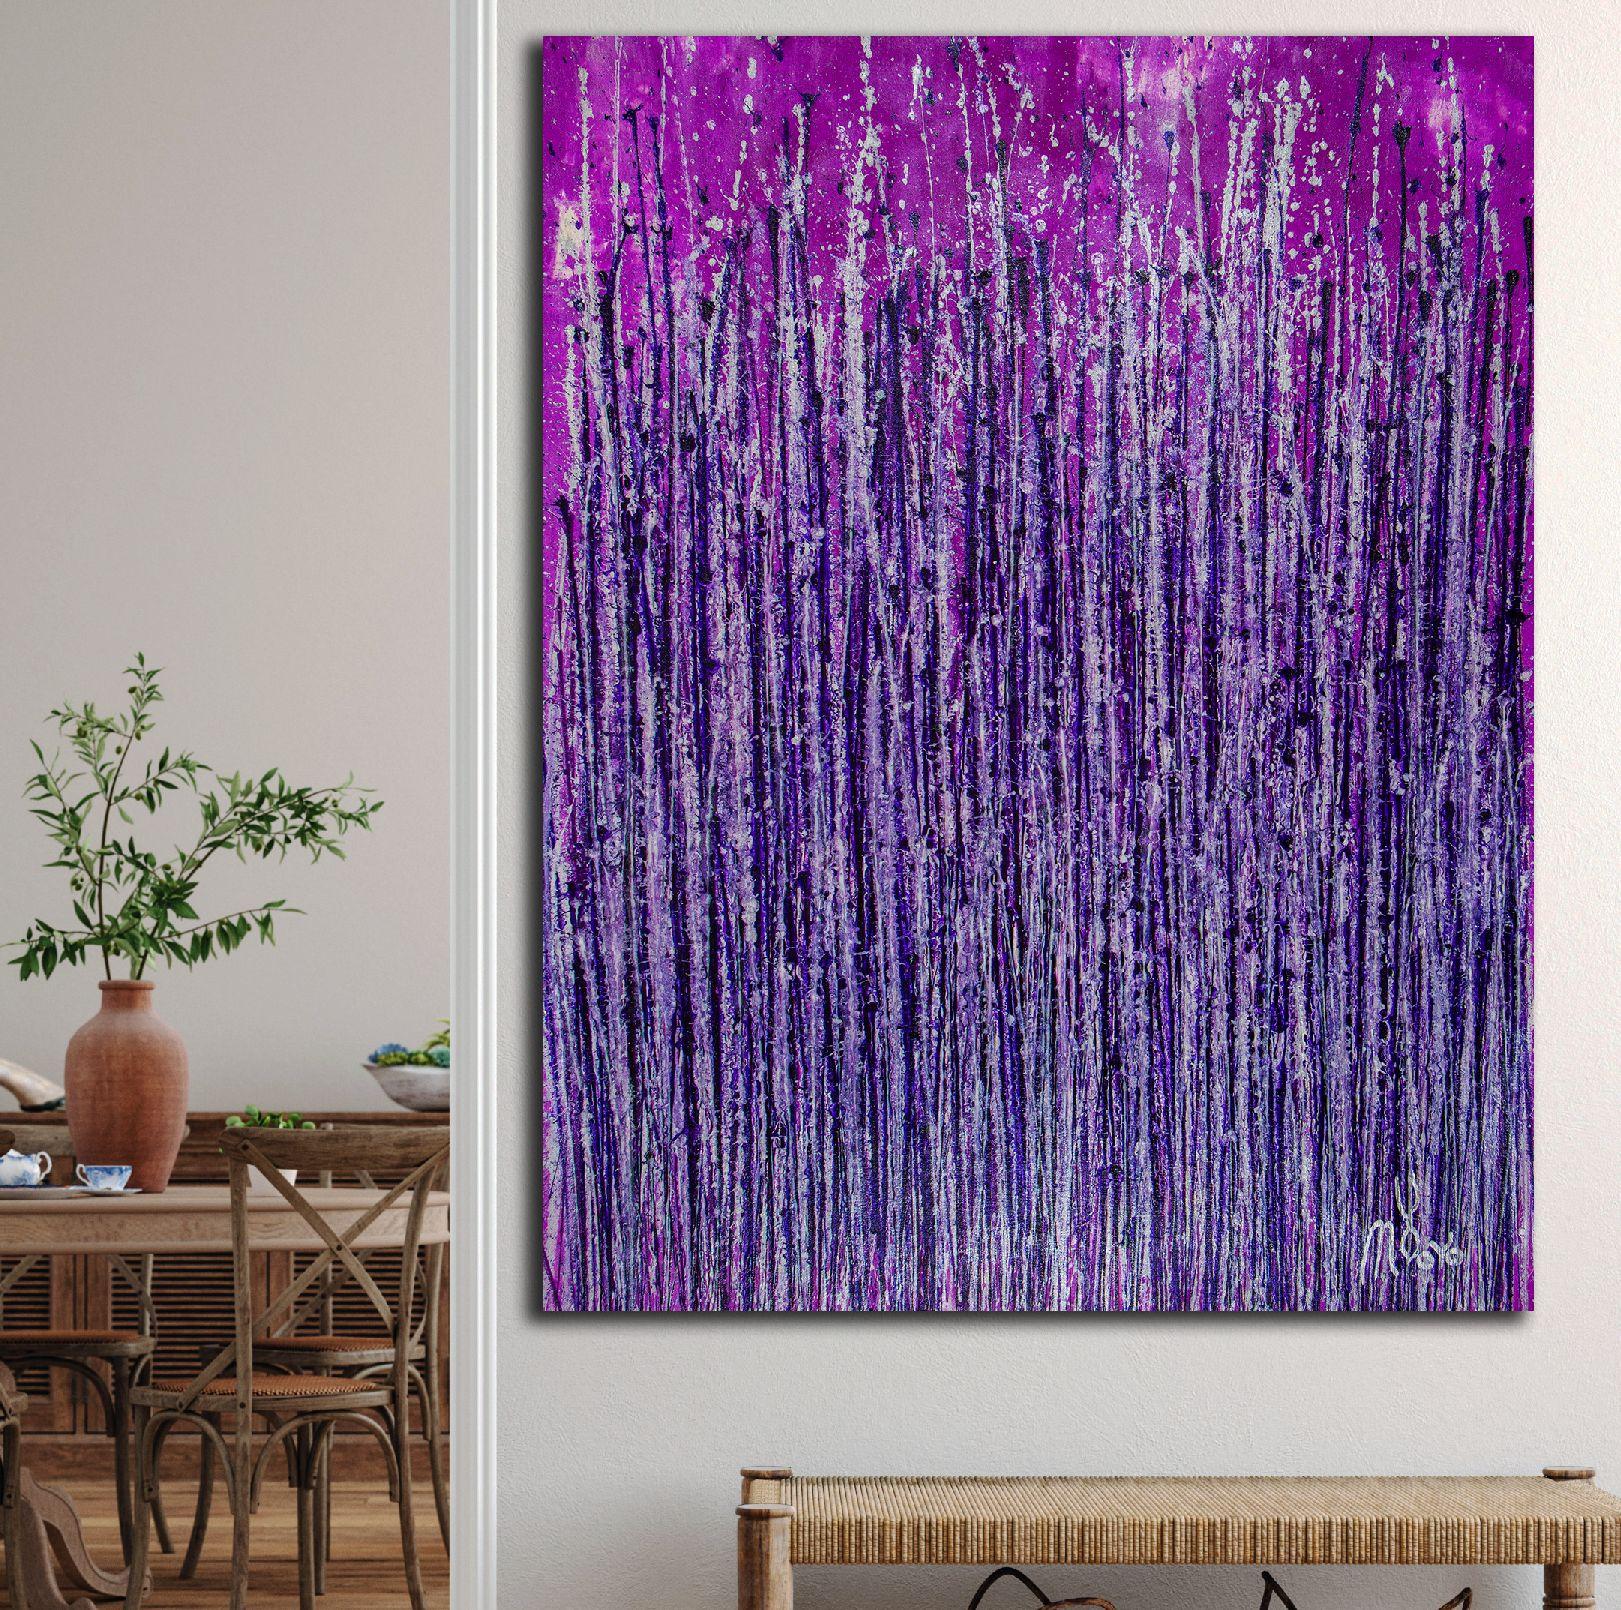 Room View - Lavish Purple Spectra (2020) by Nestor Toro